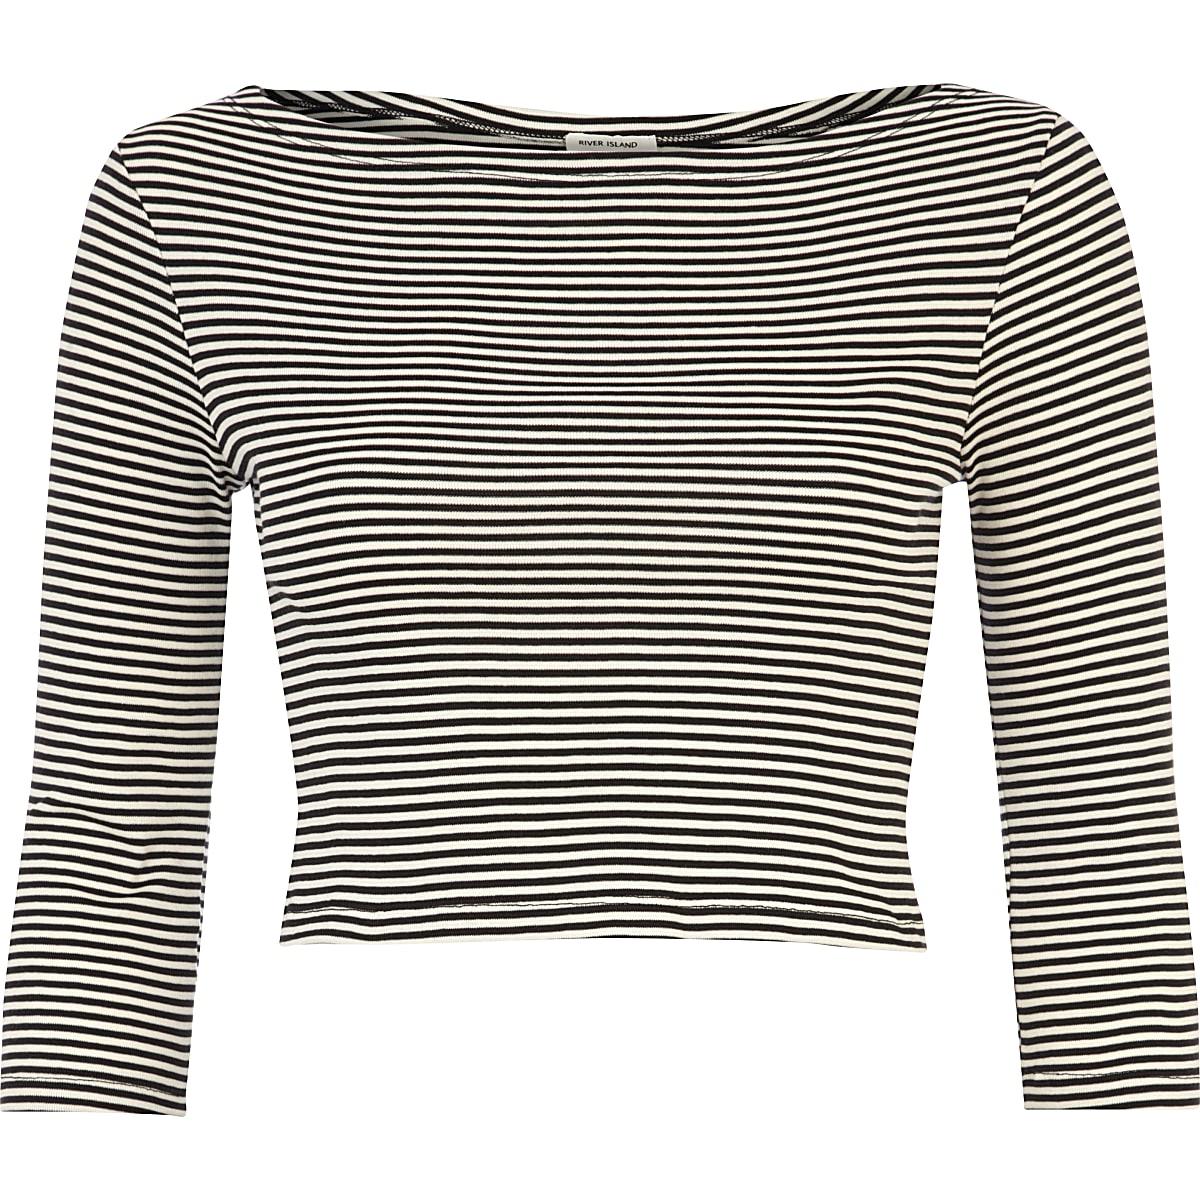 Black and white stripe crop top